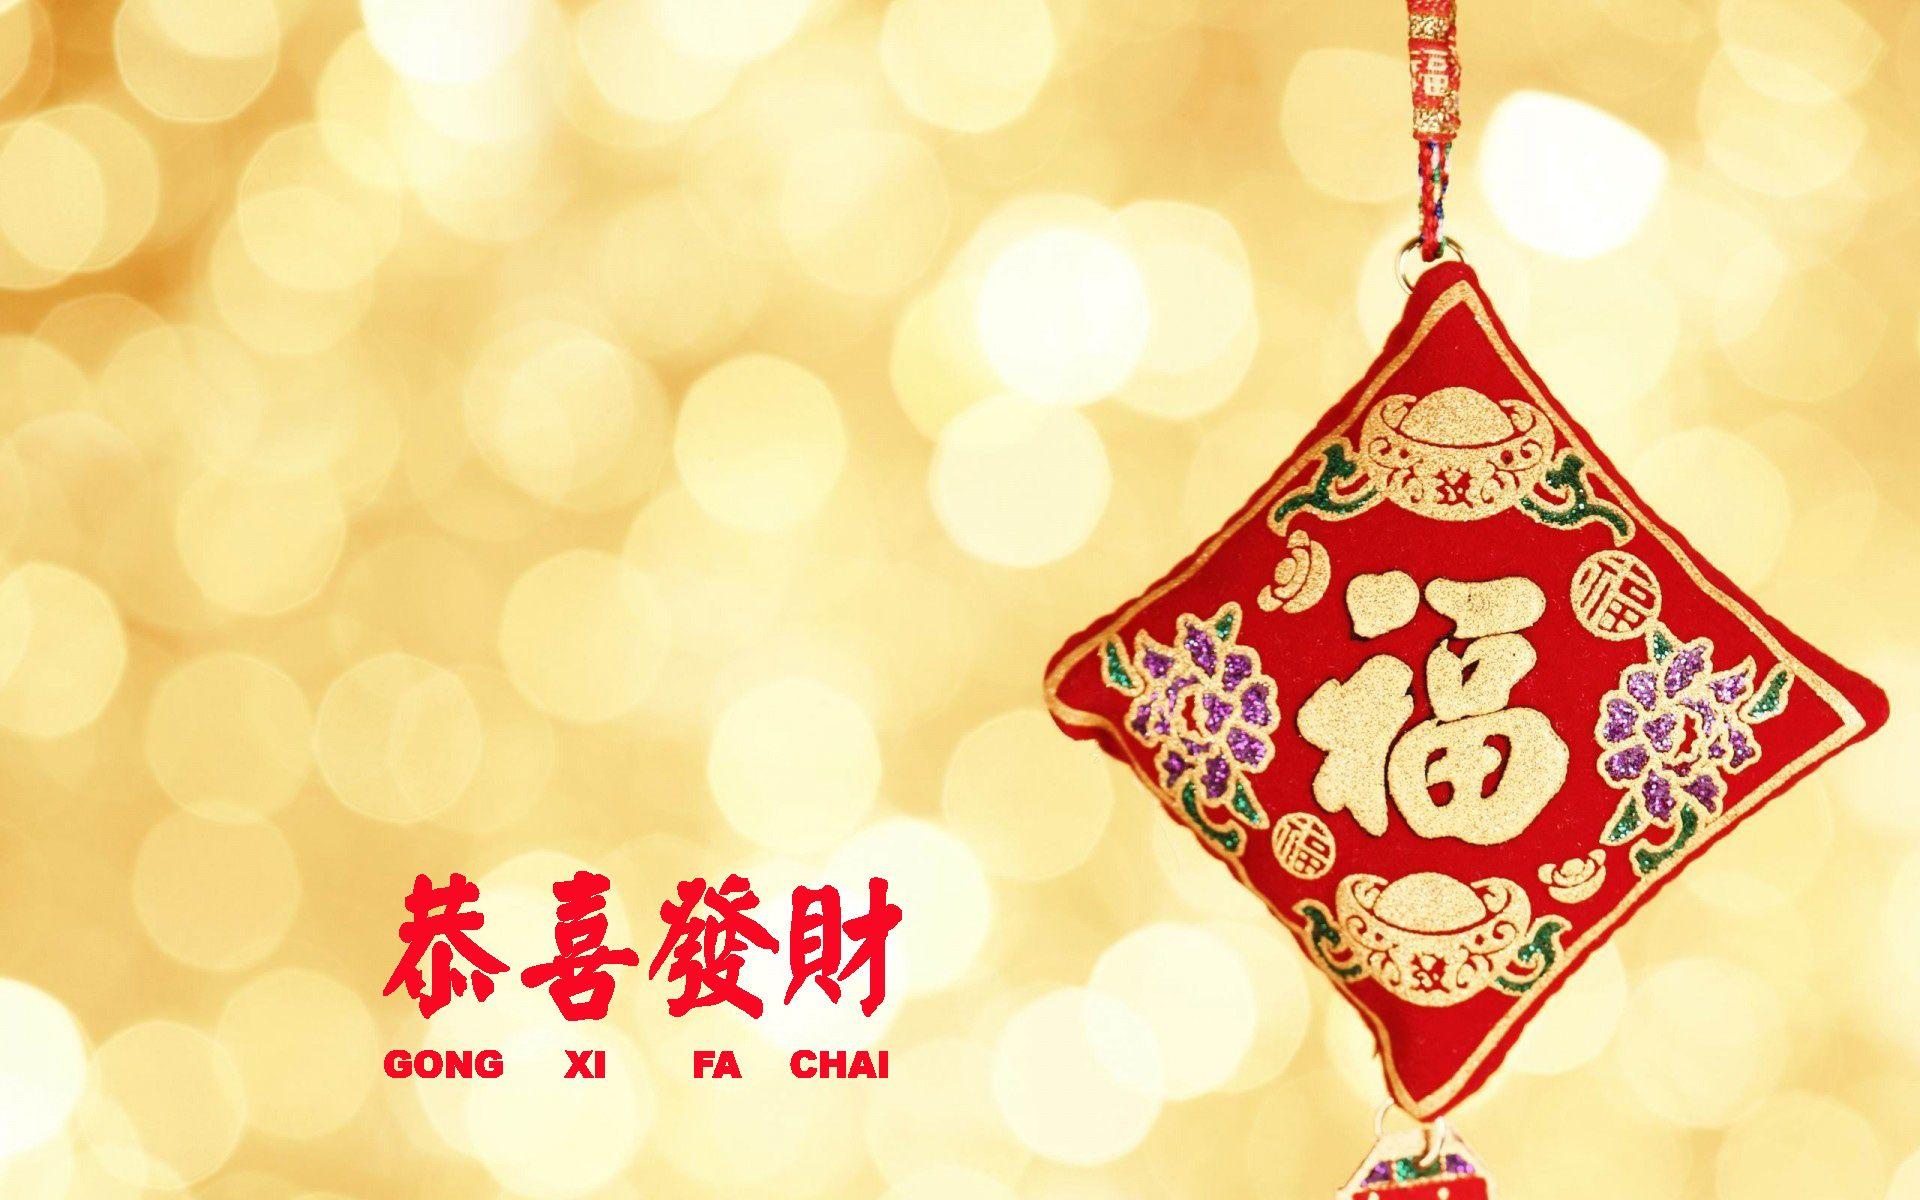 Chinese New Year Wallpaper Gong Xi Fa Cai Free Download